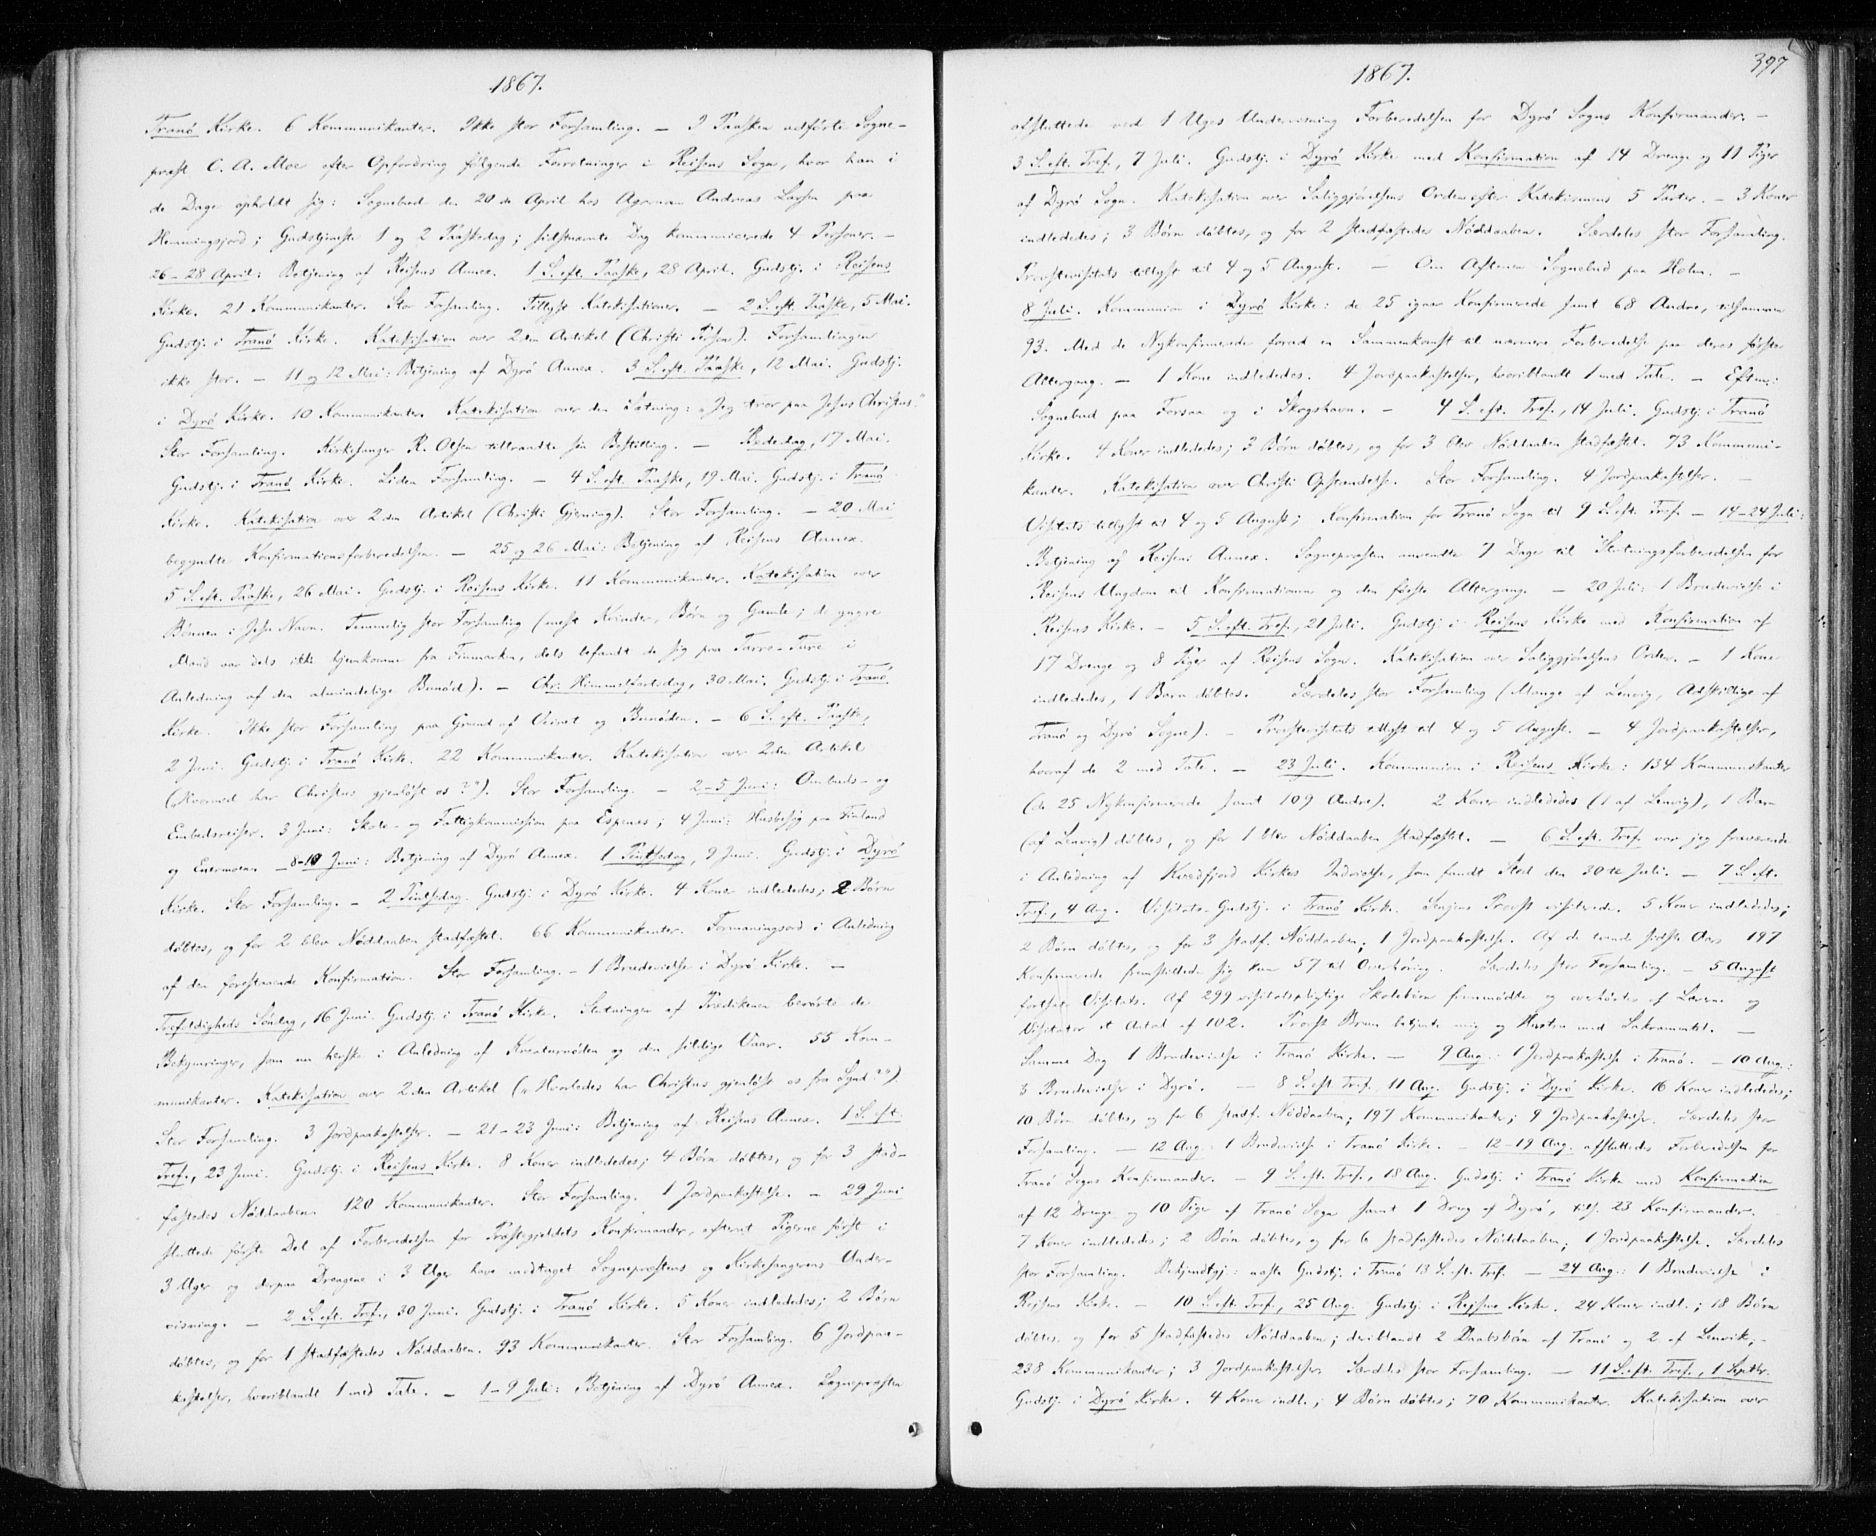 SATØ, Tranøy sokneprestkontor, I/Ia/Iaa/L0008kirke: Ministerialbok nr. 8, 1867-1877, s. 397